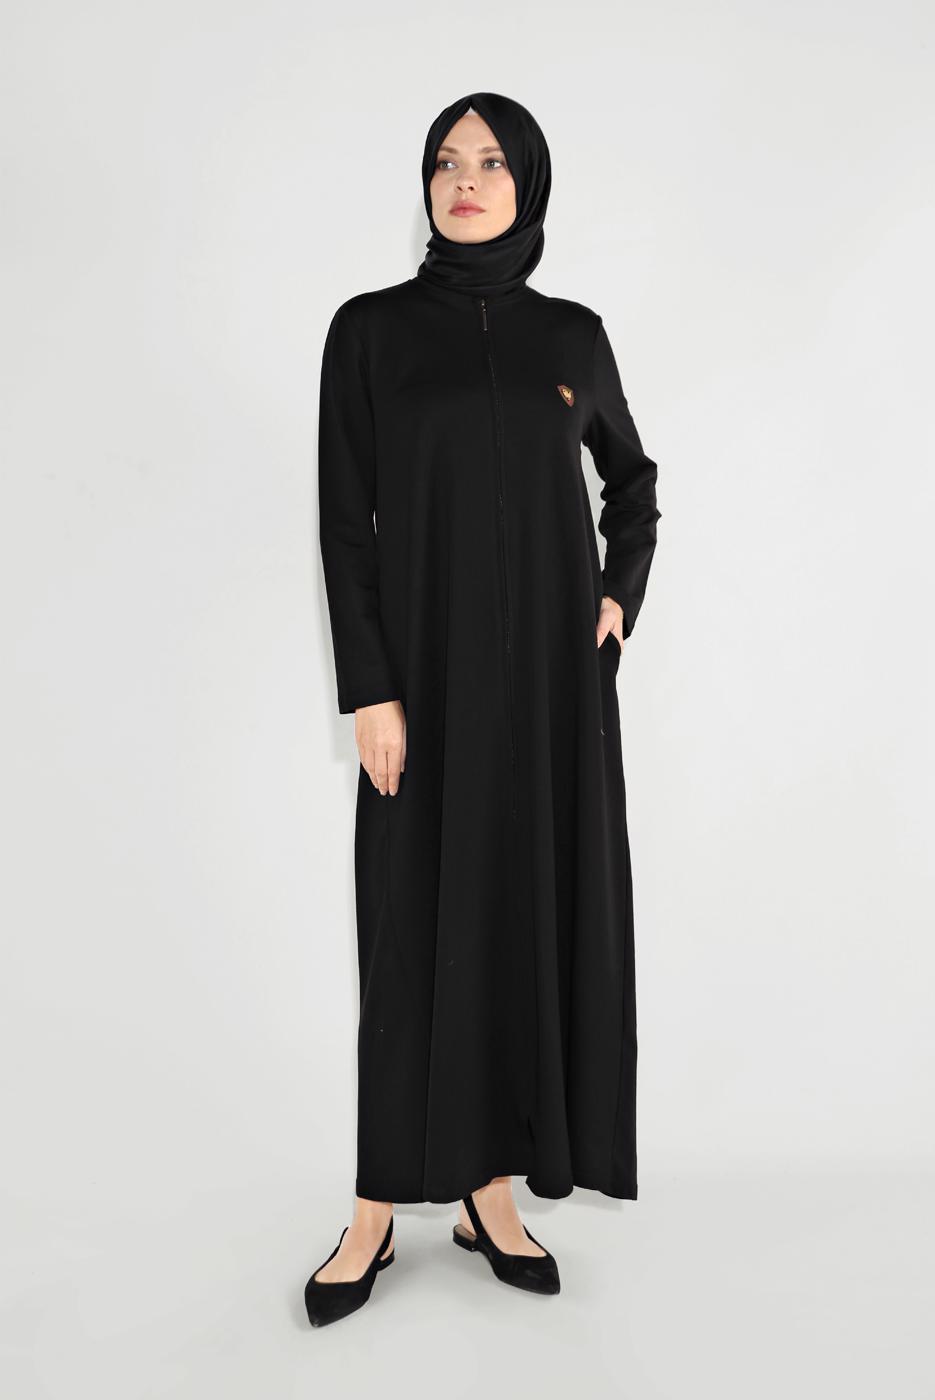 Bayan SİYAH BİSİKLET YAKA FERMUARLI FERACE 25106